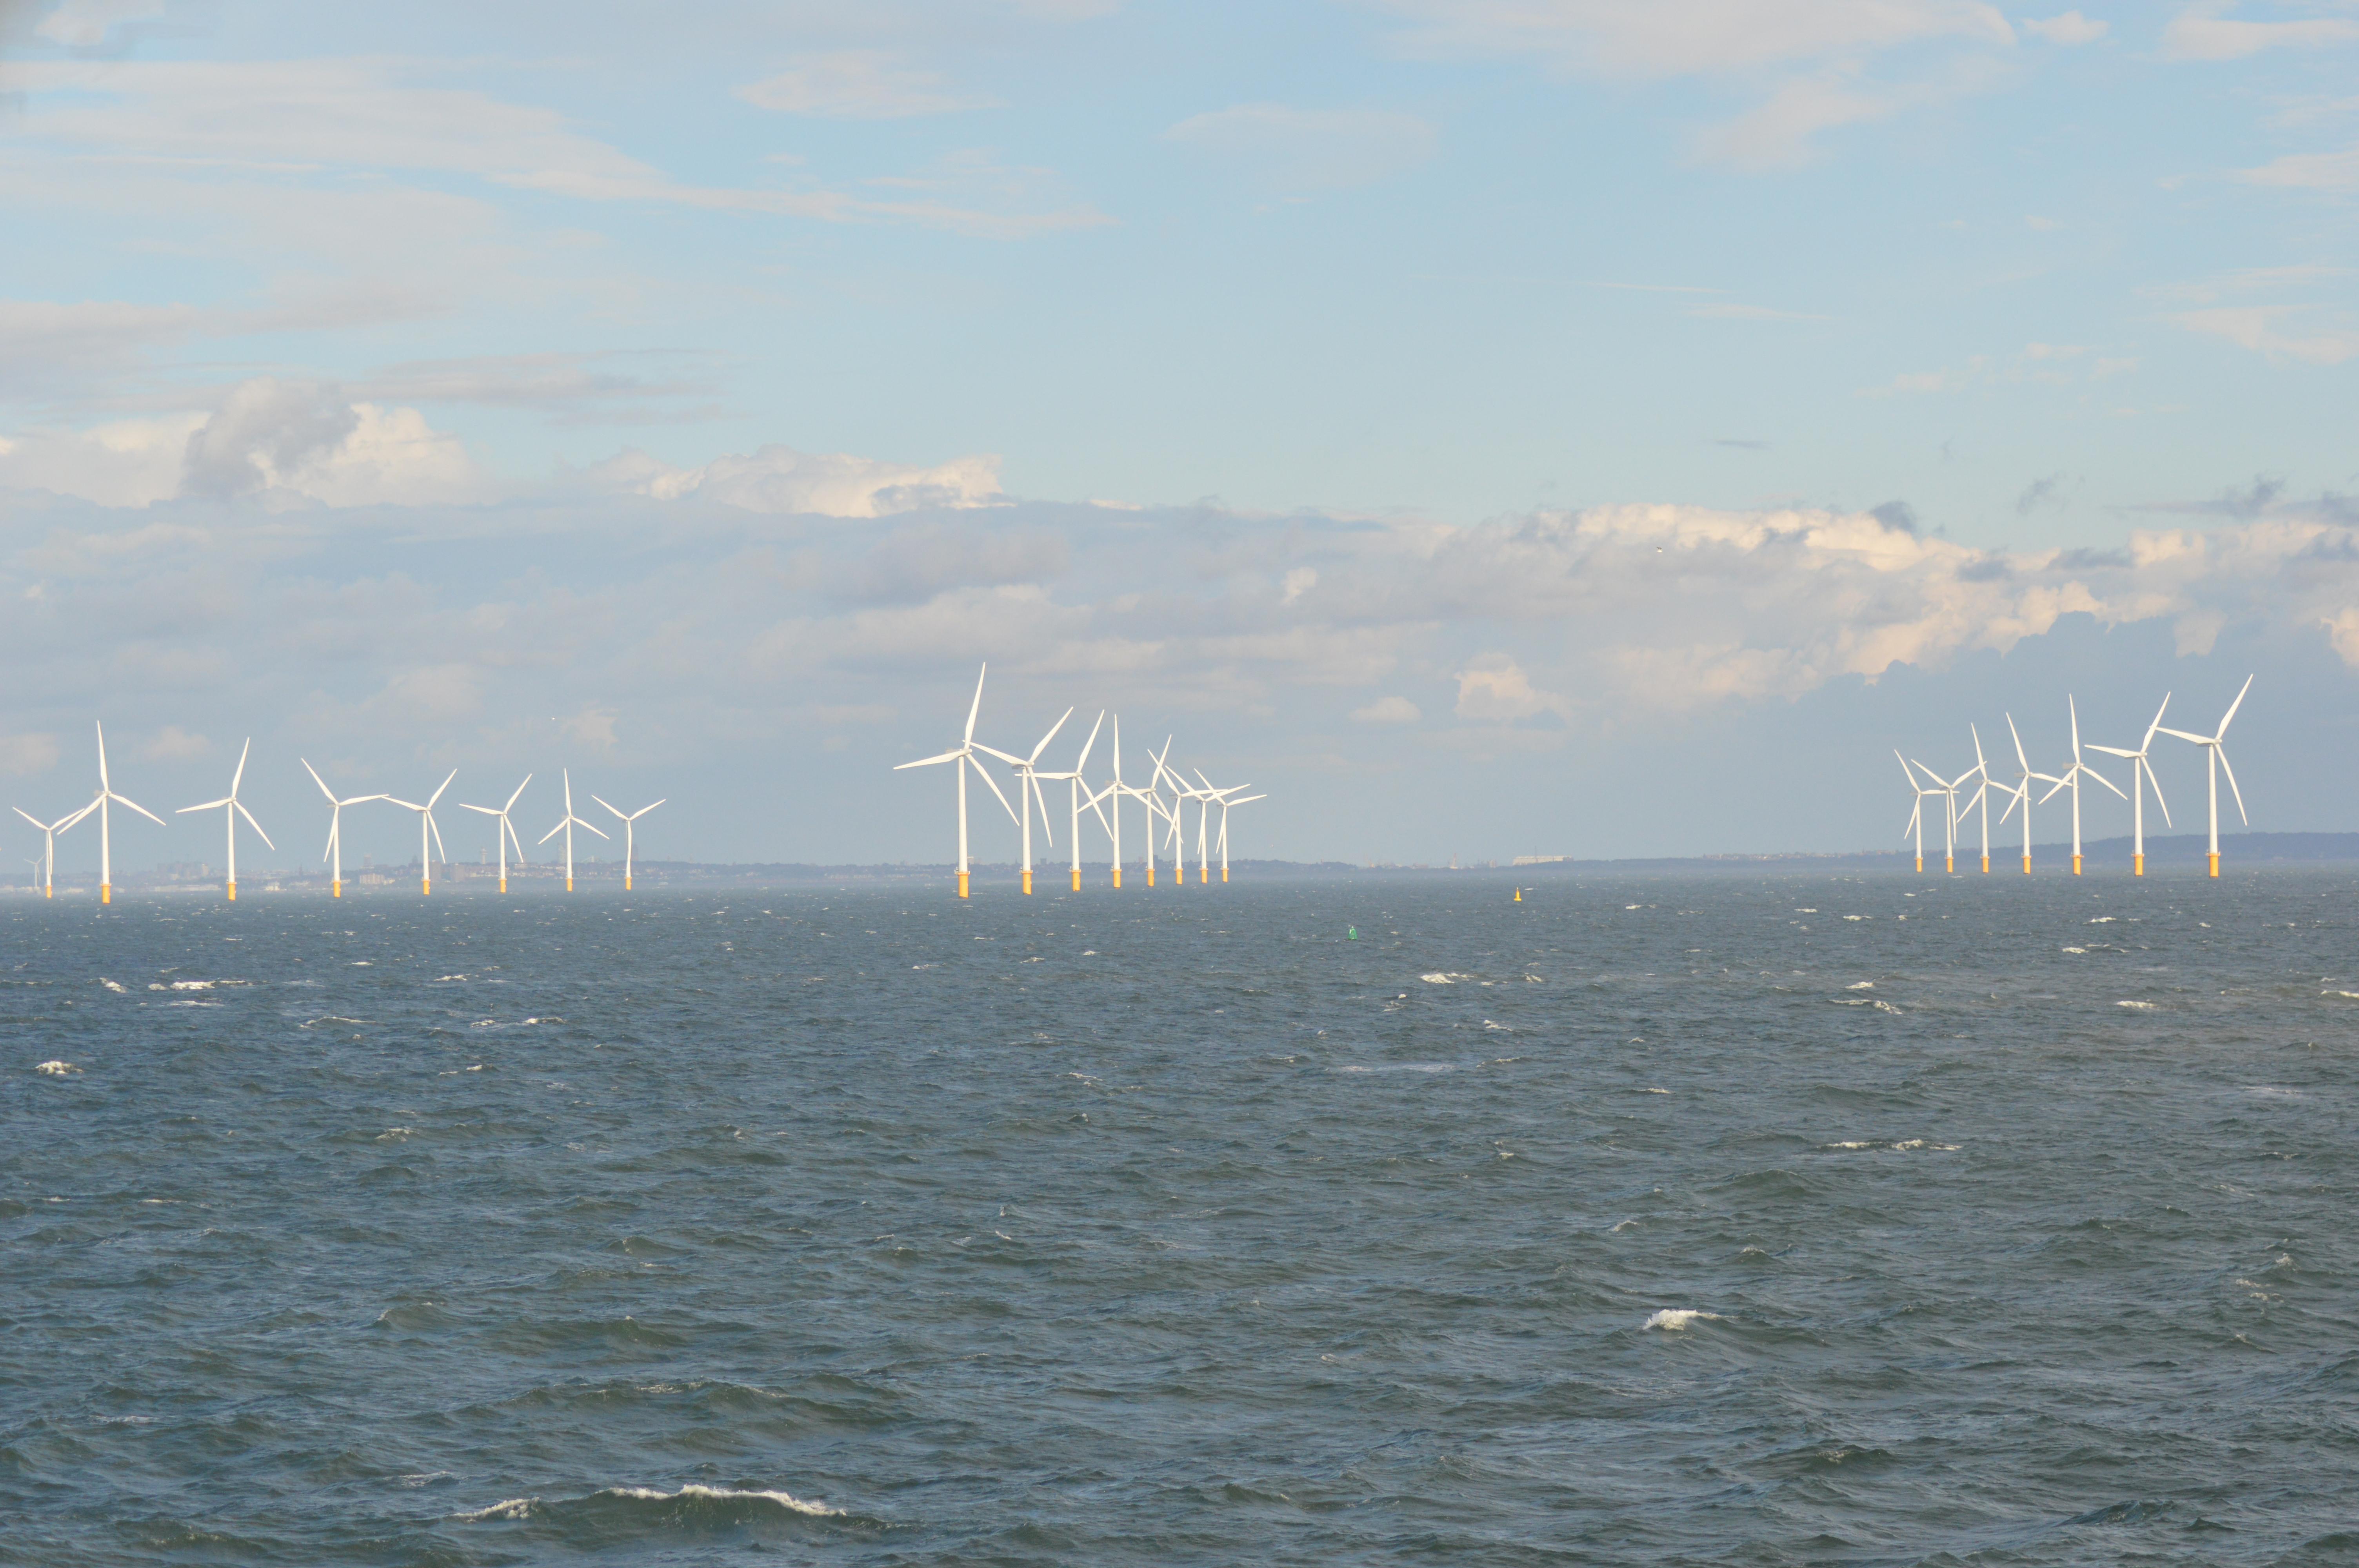 Rampion Wind Farm Tours